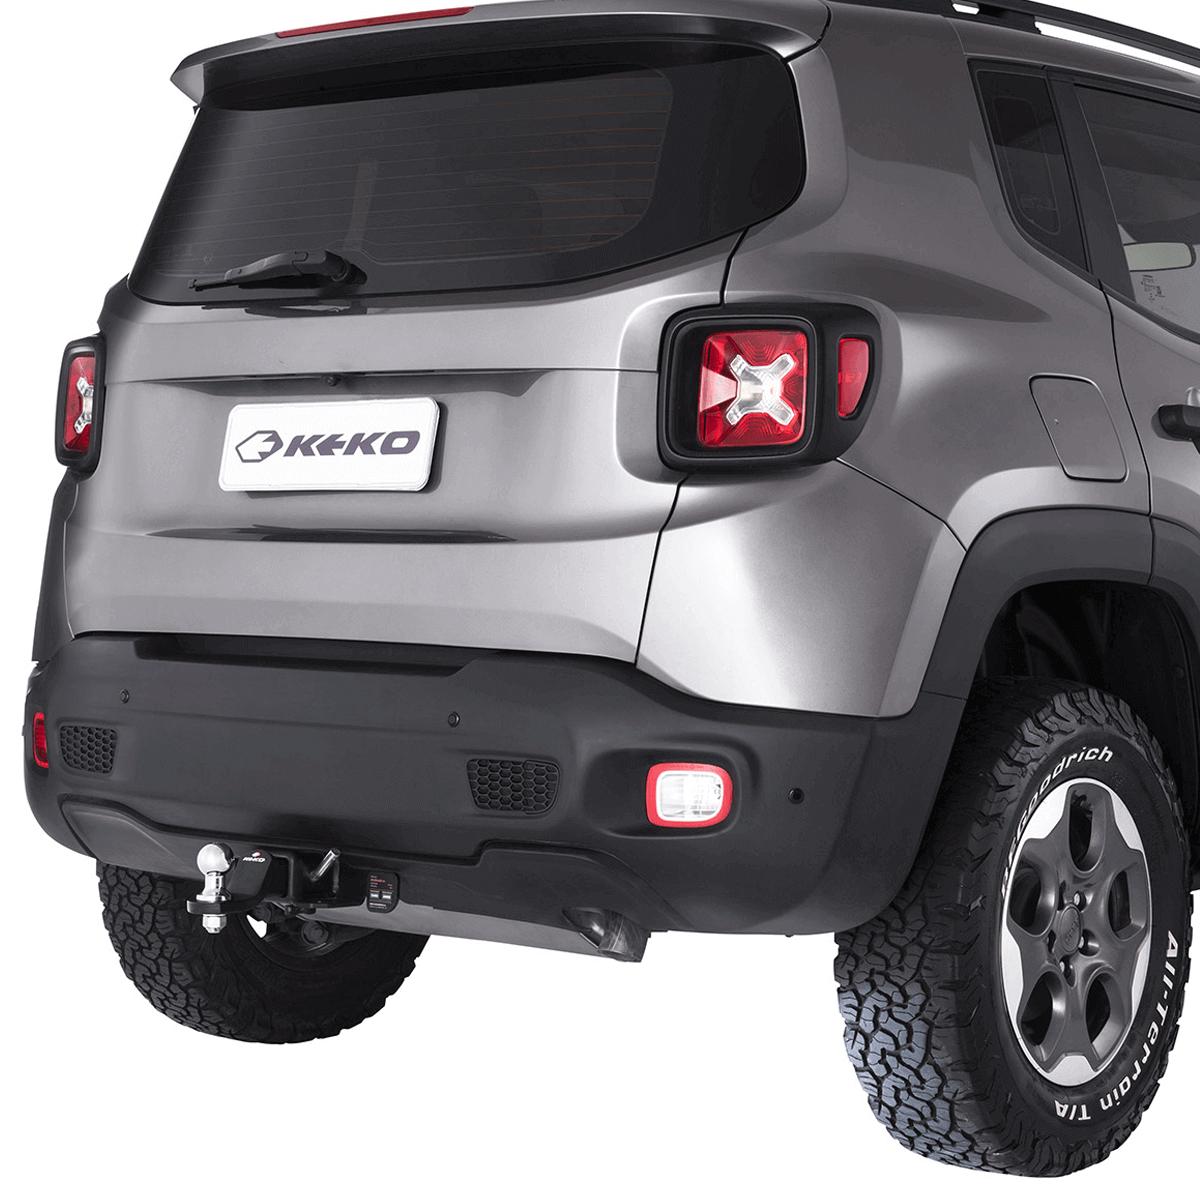 Engate de reboque removível Keko K1 Jeep Renegade 2016 a 2021